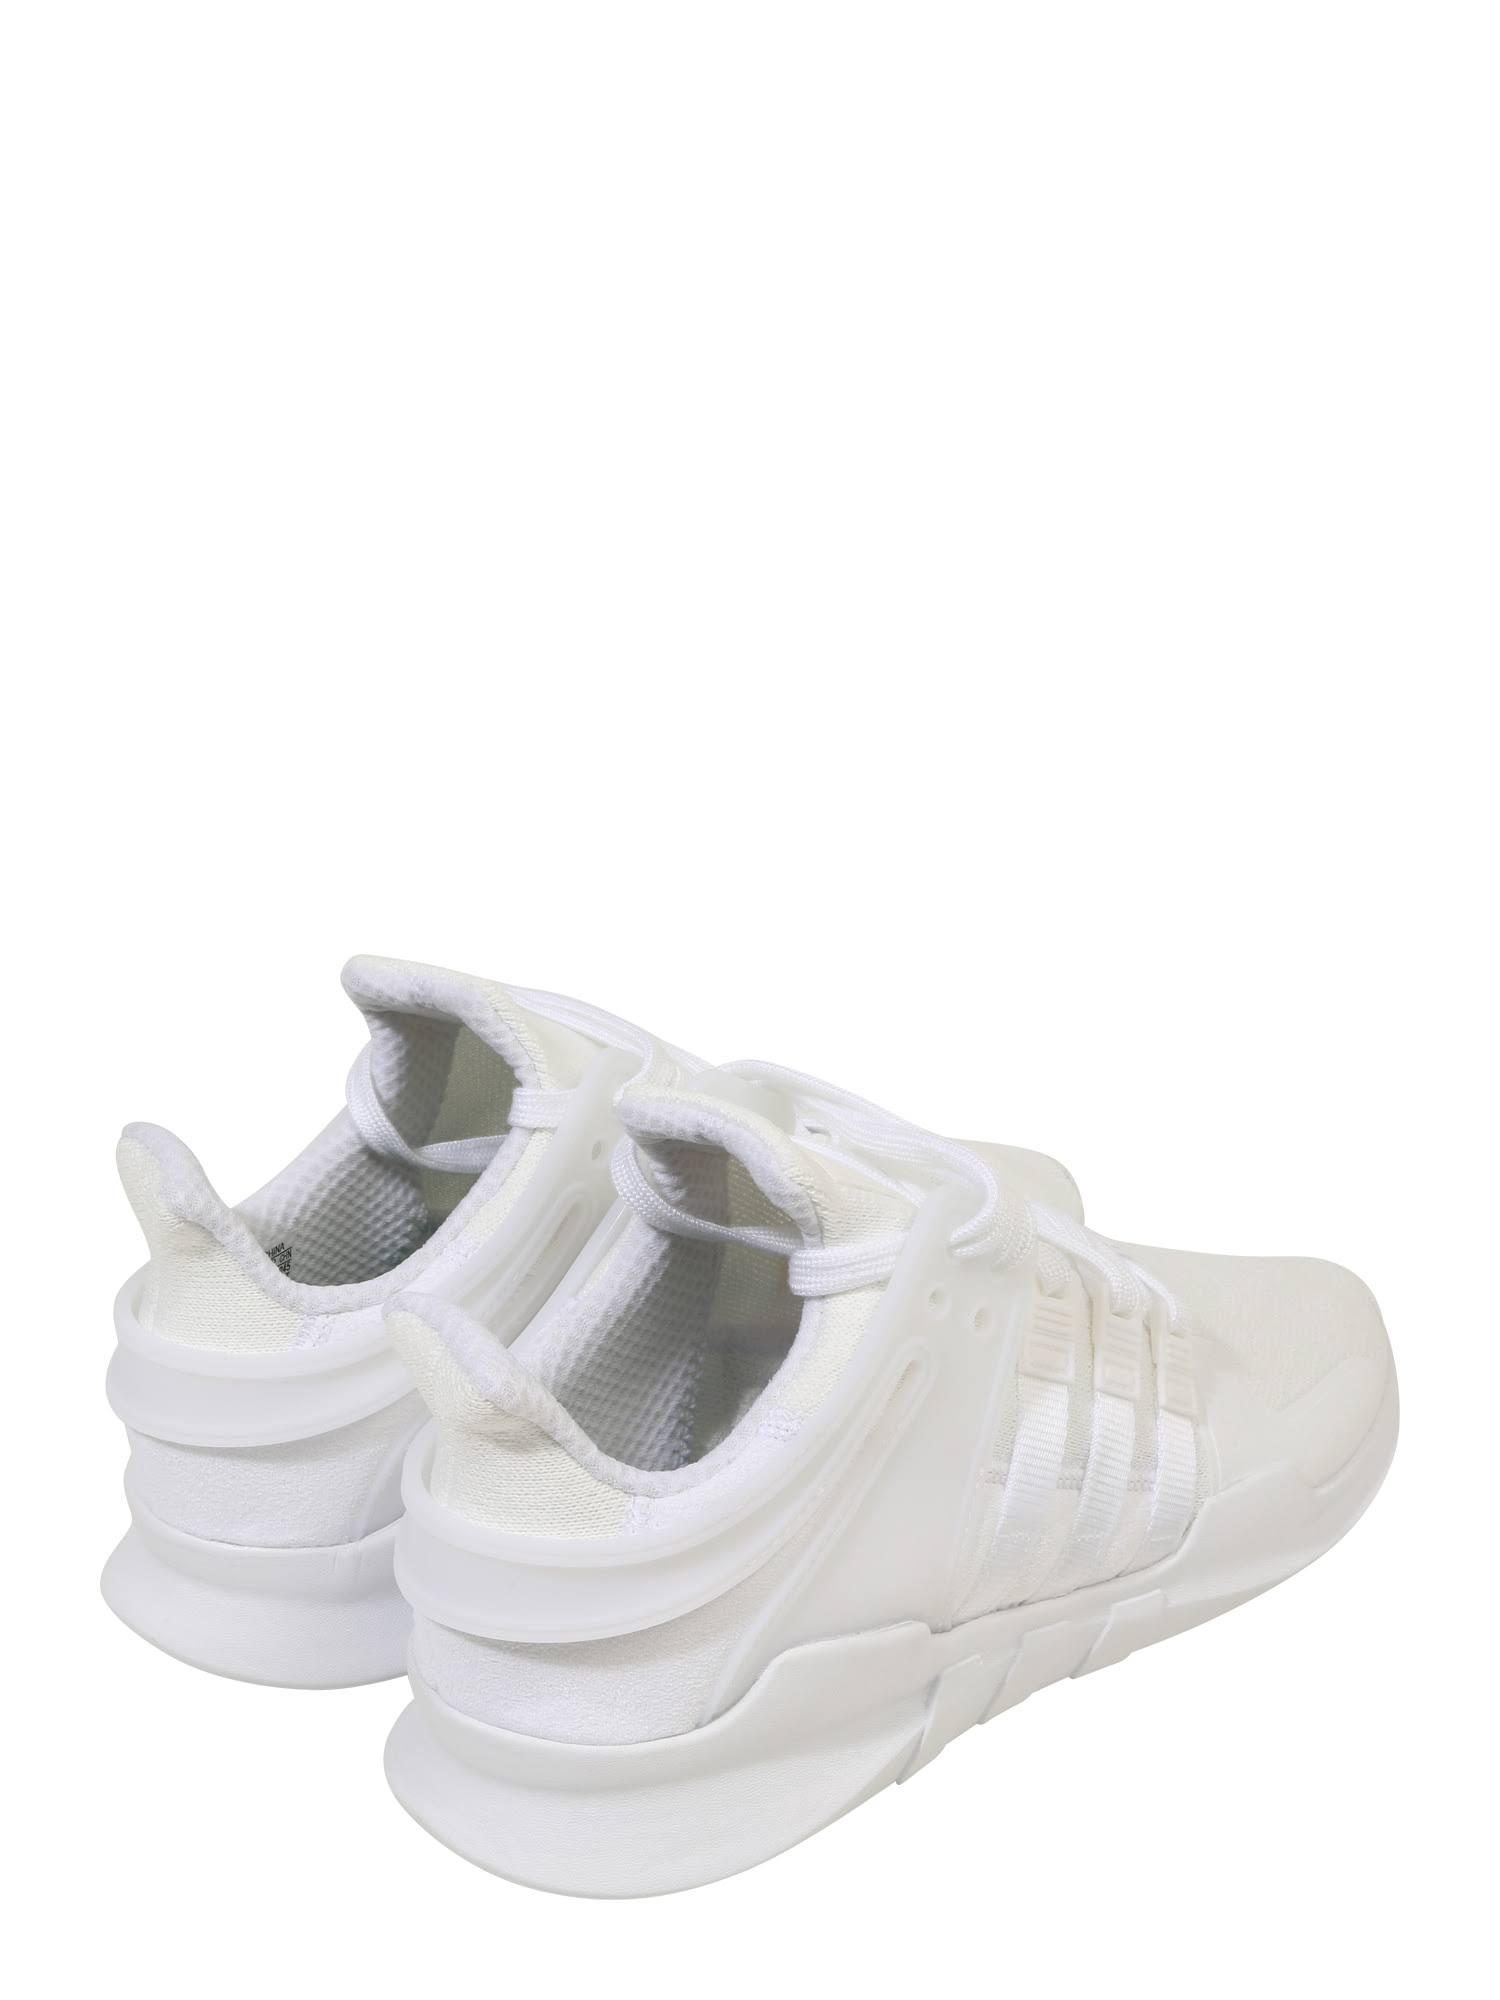 Adv ftwr Adidas Sneaker Eqt Support White core Elfenbein ftwr Black White O6qSEw